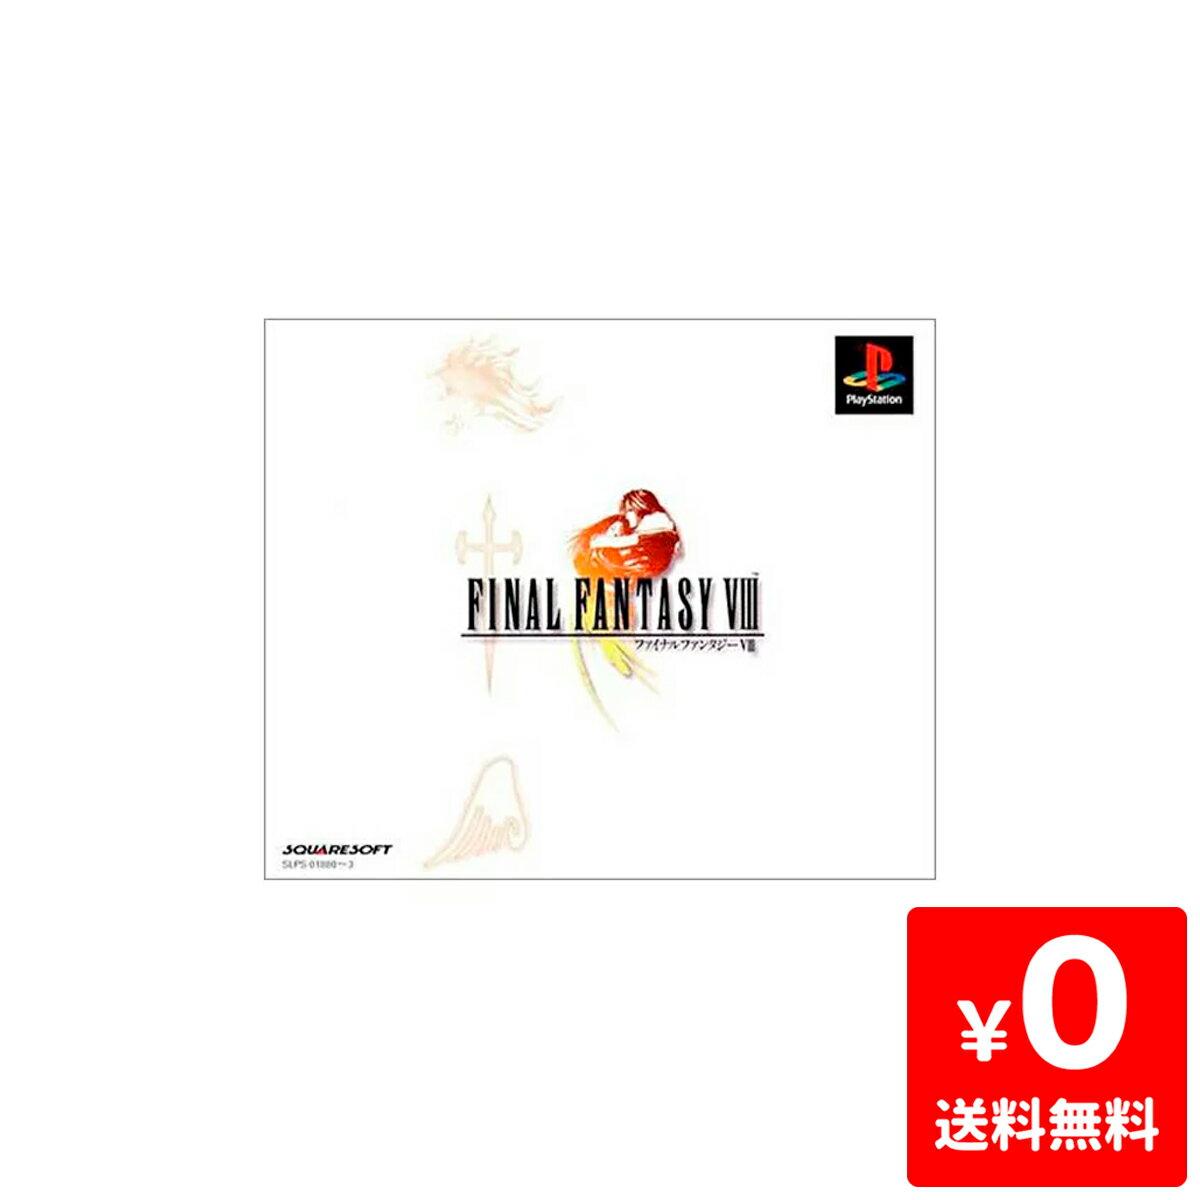 PS ファイナルファンタジーVIII FF8 ソフト プレステ プレイステーション PlayStation SONY 【中古】 4961012987054 送料無料